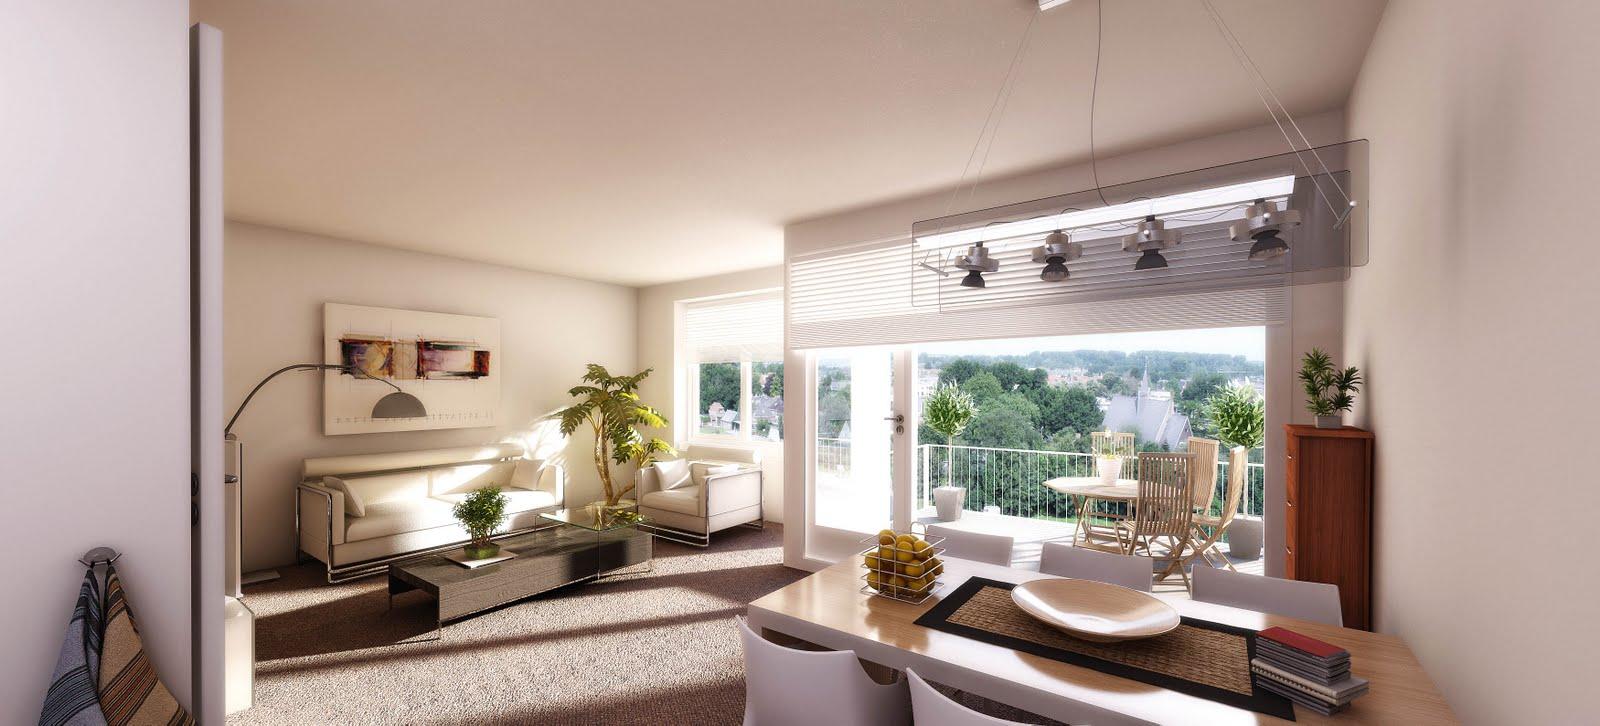 Huis interieur appartement interieur idee n voor 2012 for Interieur huis